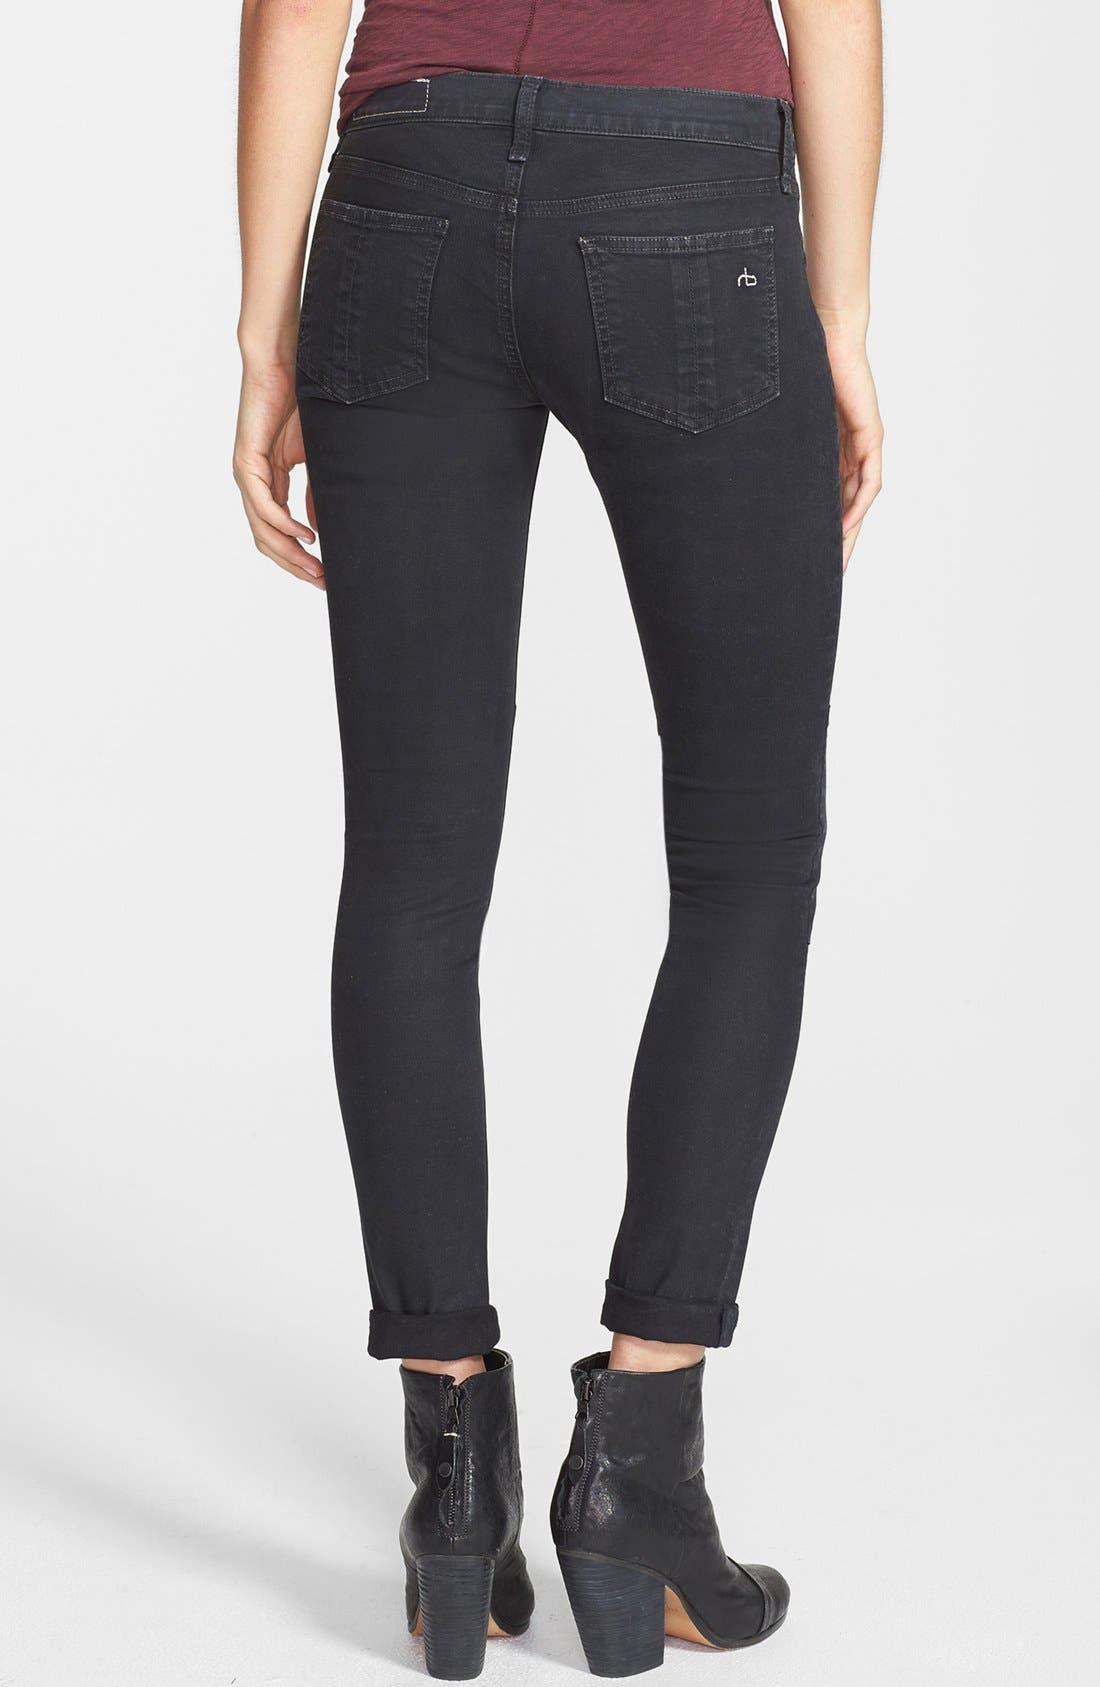 Alternate Image 2  - rag & bone/JEAN 'Ridley' Moto Skinny Jeans (Wax Black)